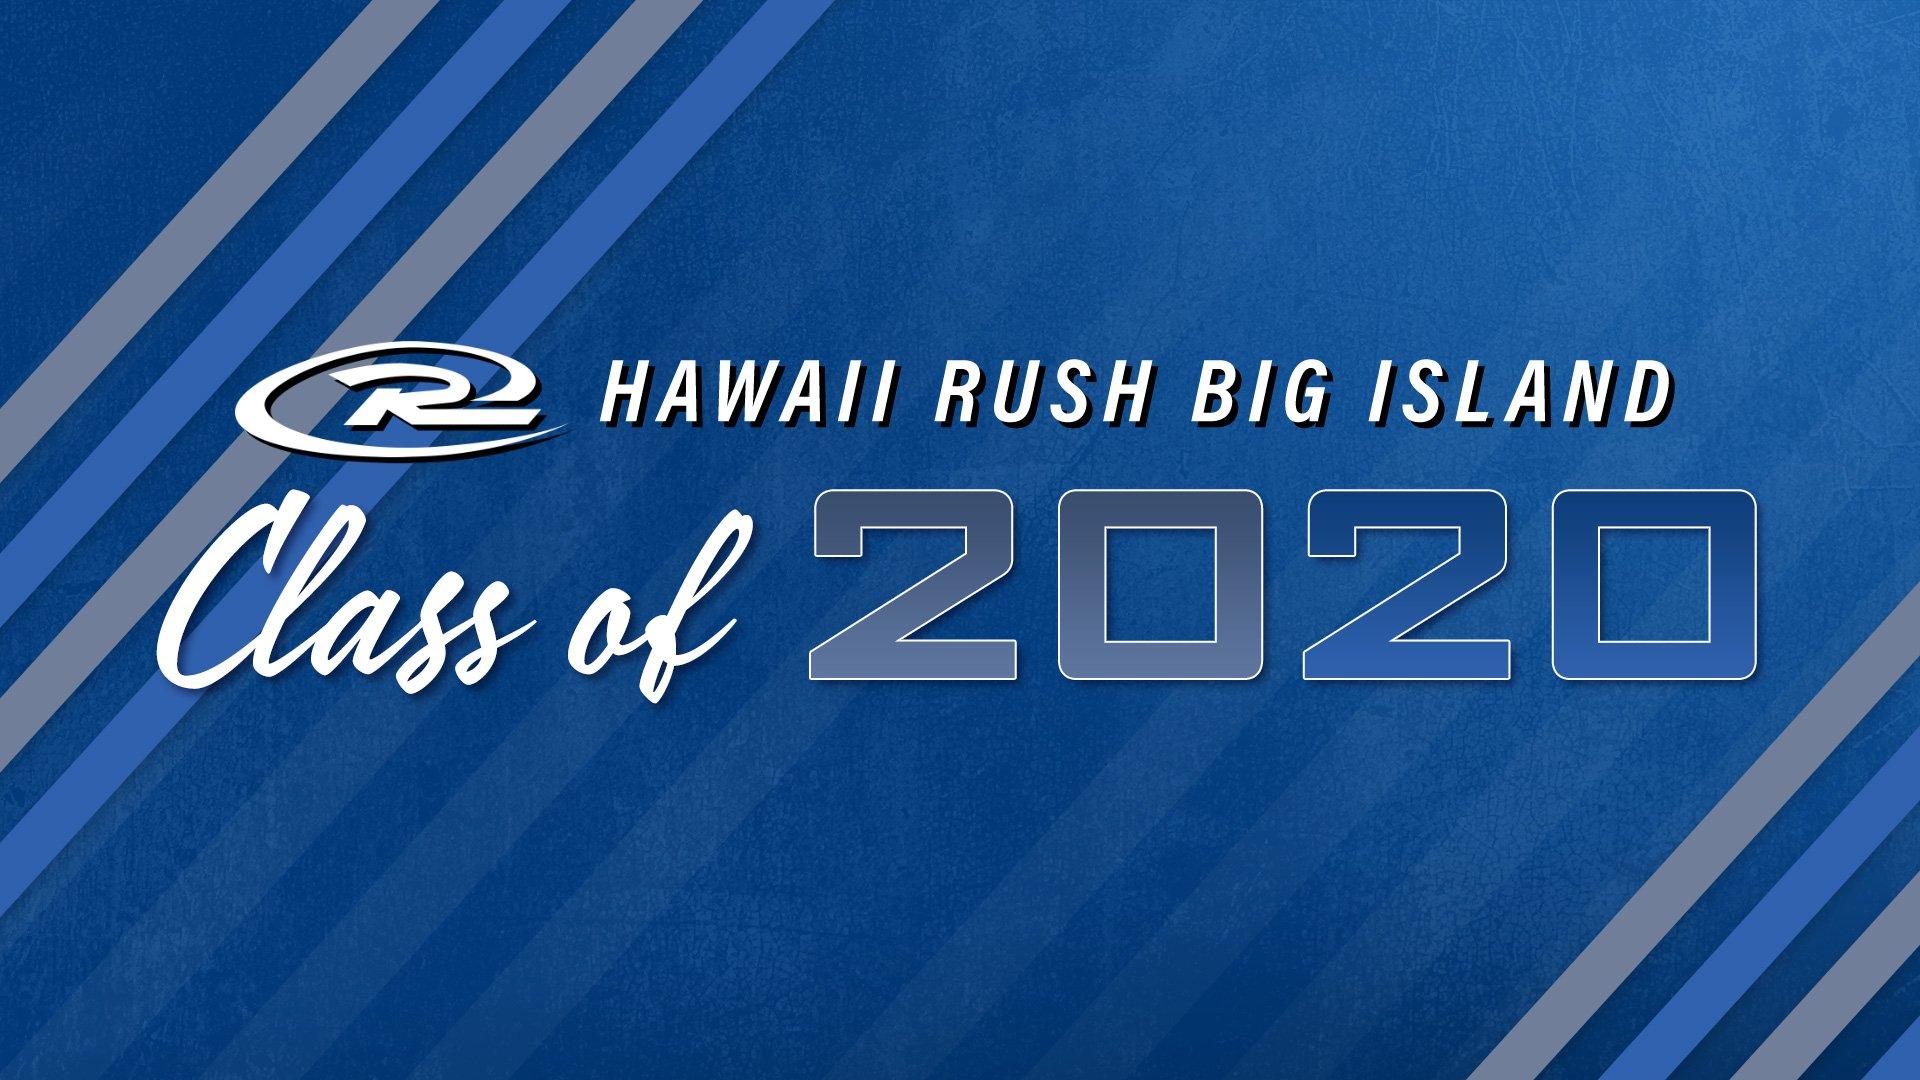 Hawaii Rush Big Island Senior Class of 2020